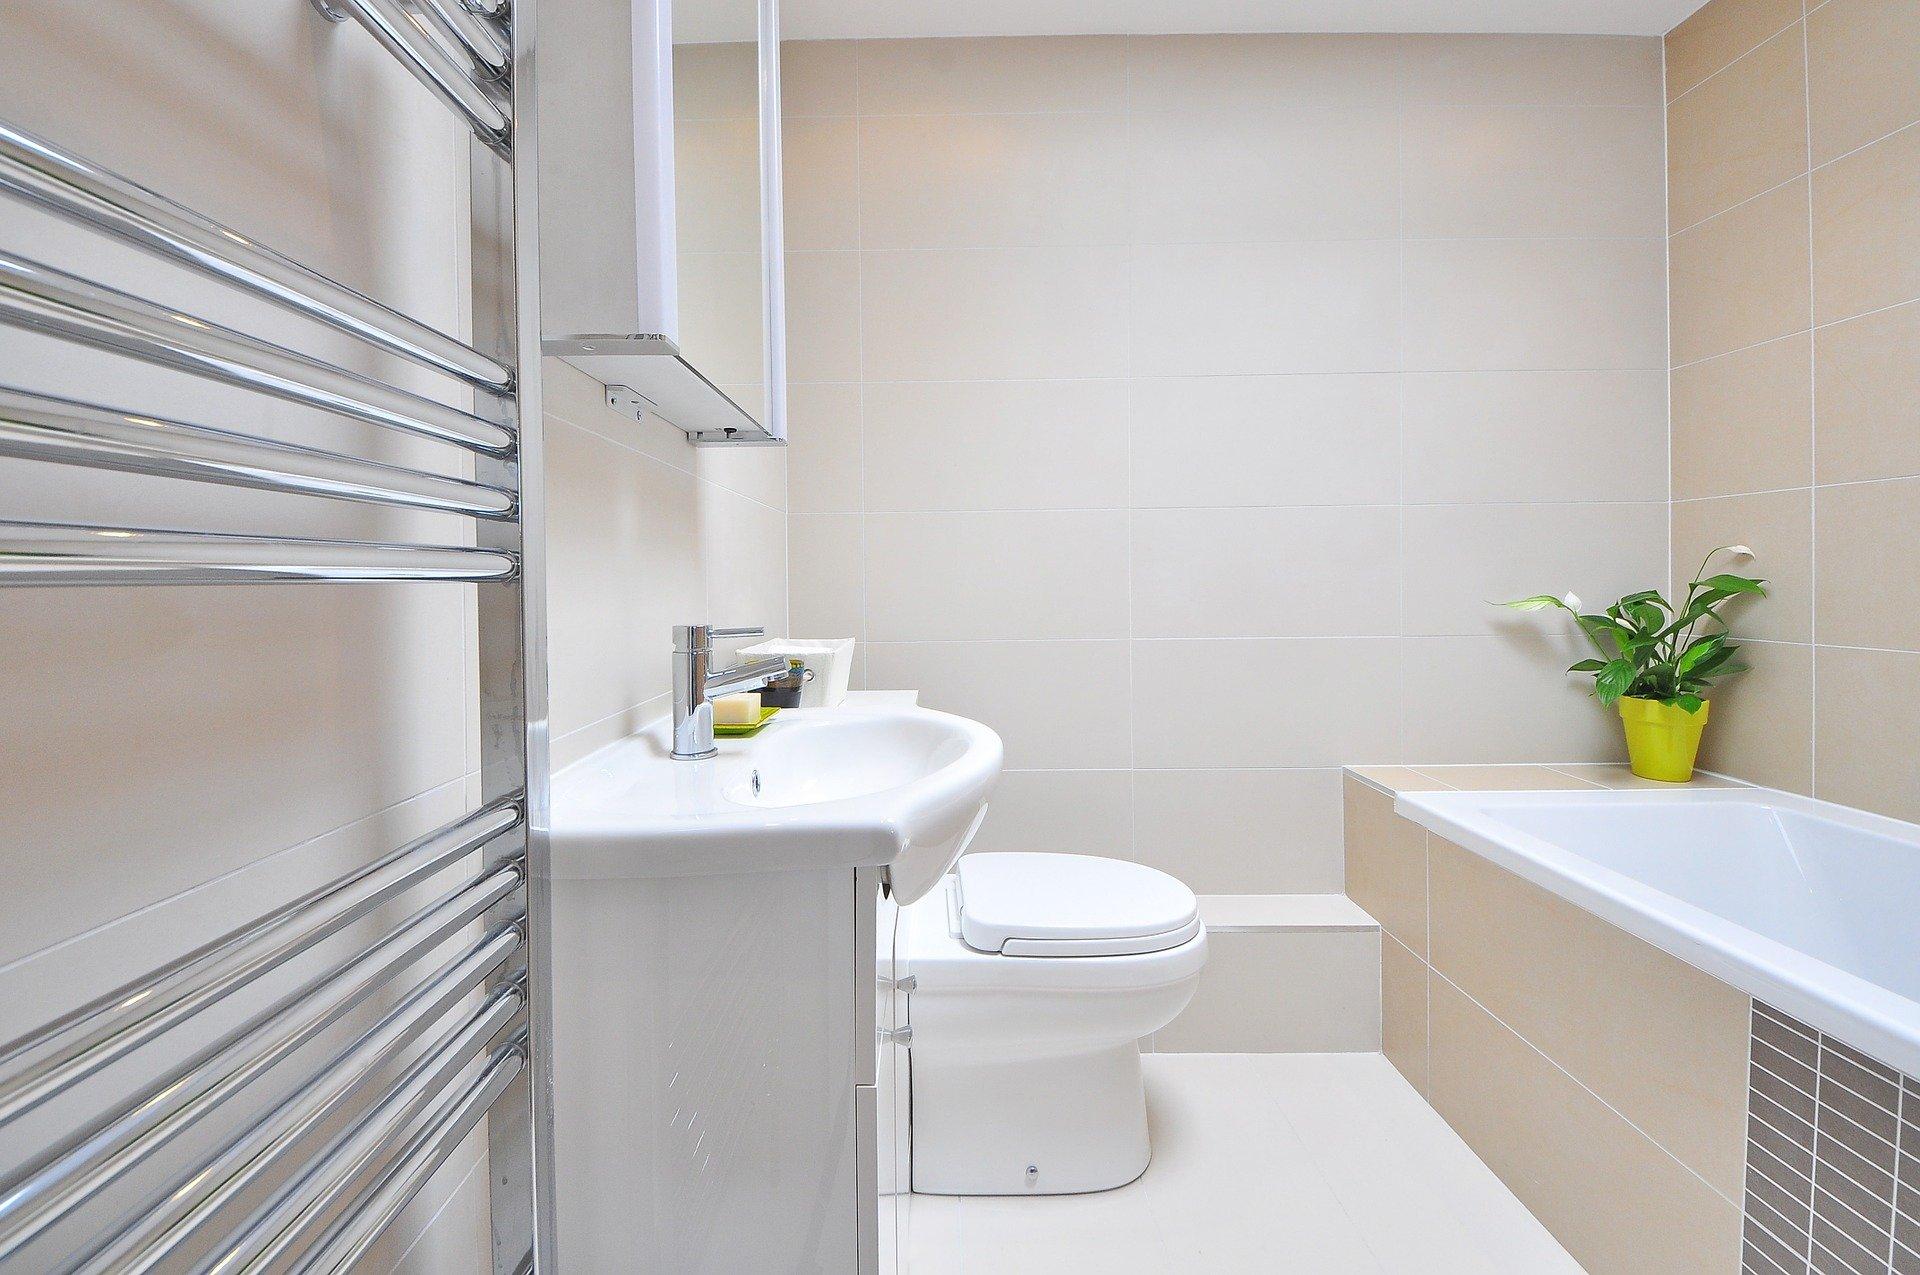 Small Bathroom Design Tips in 2021